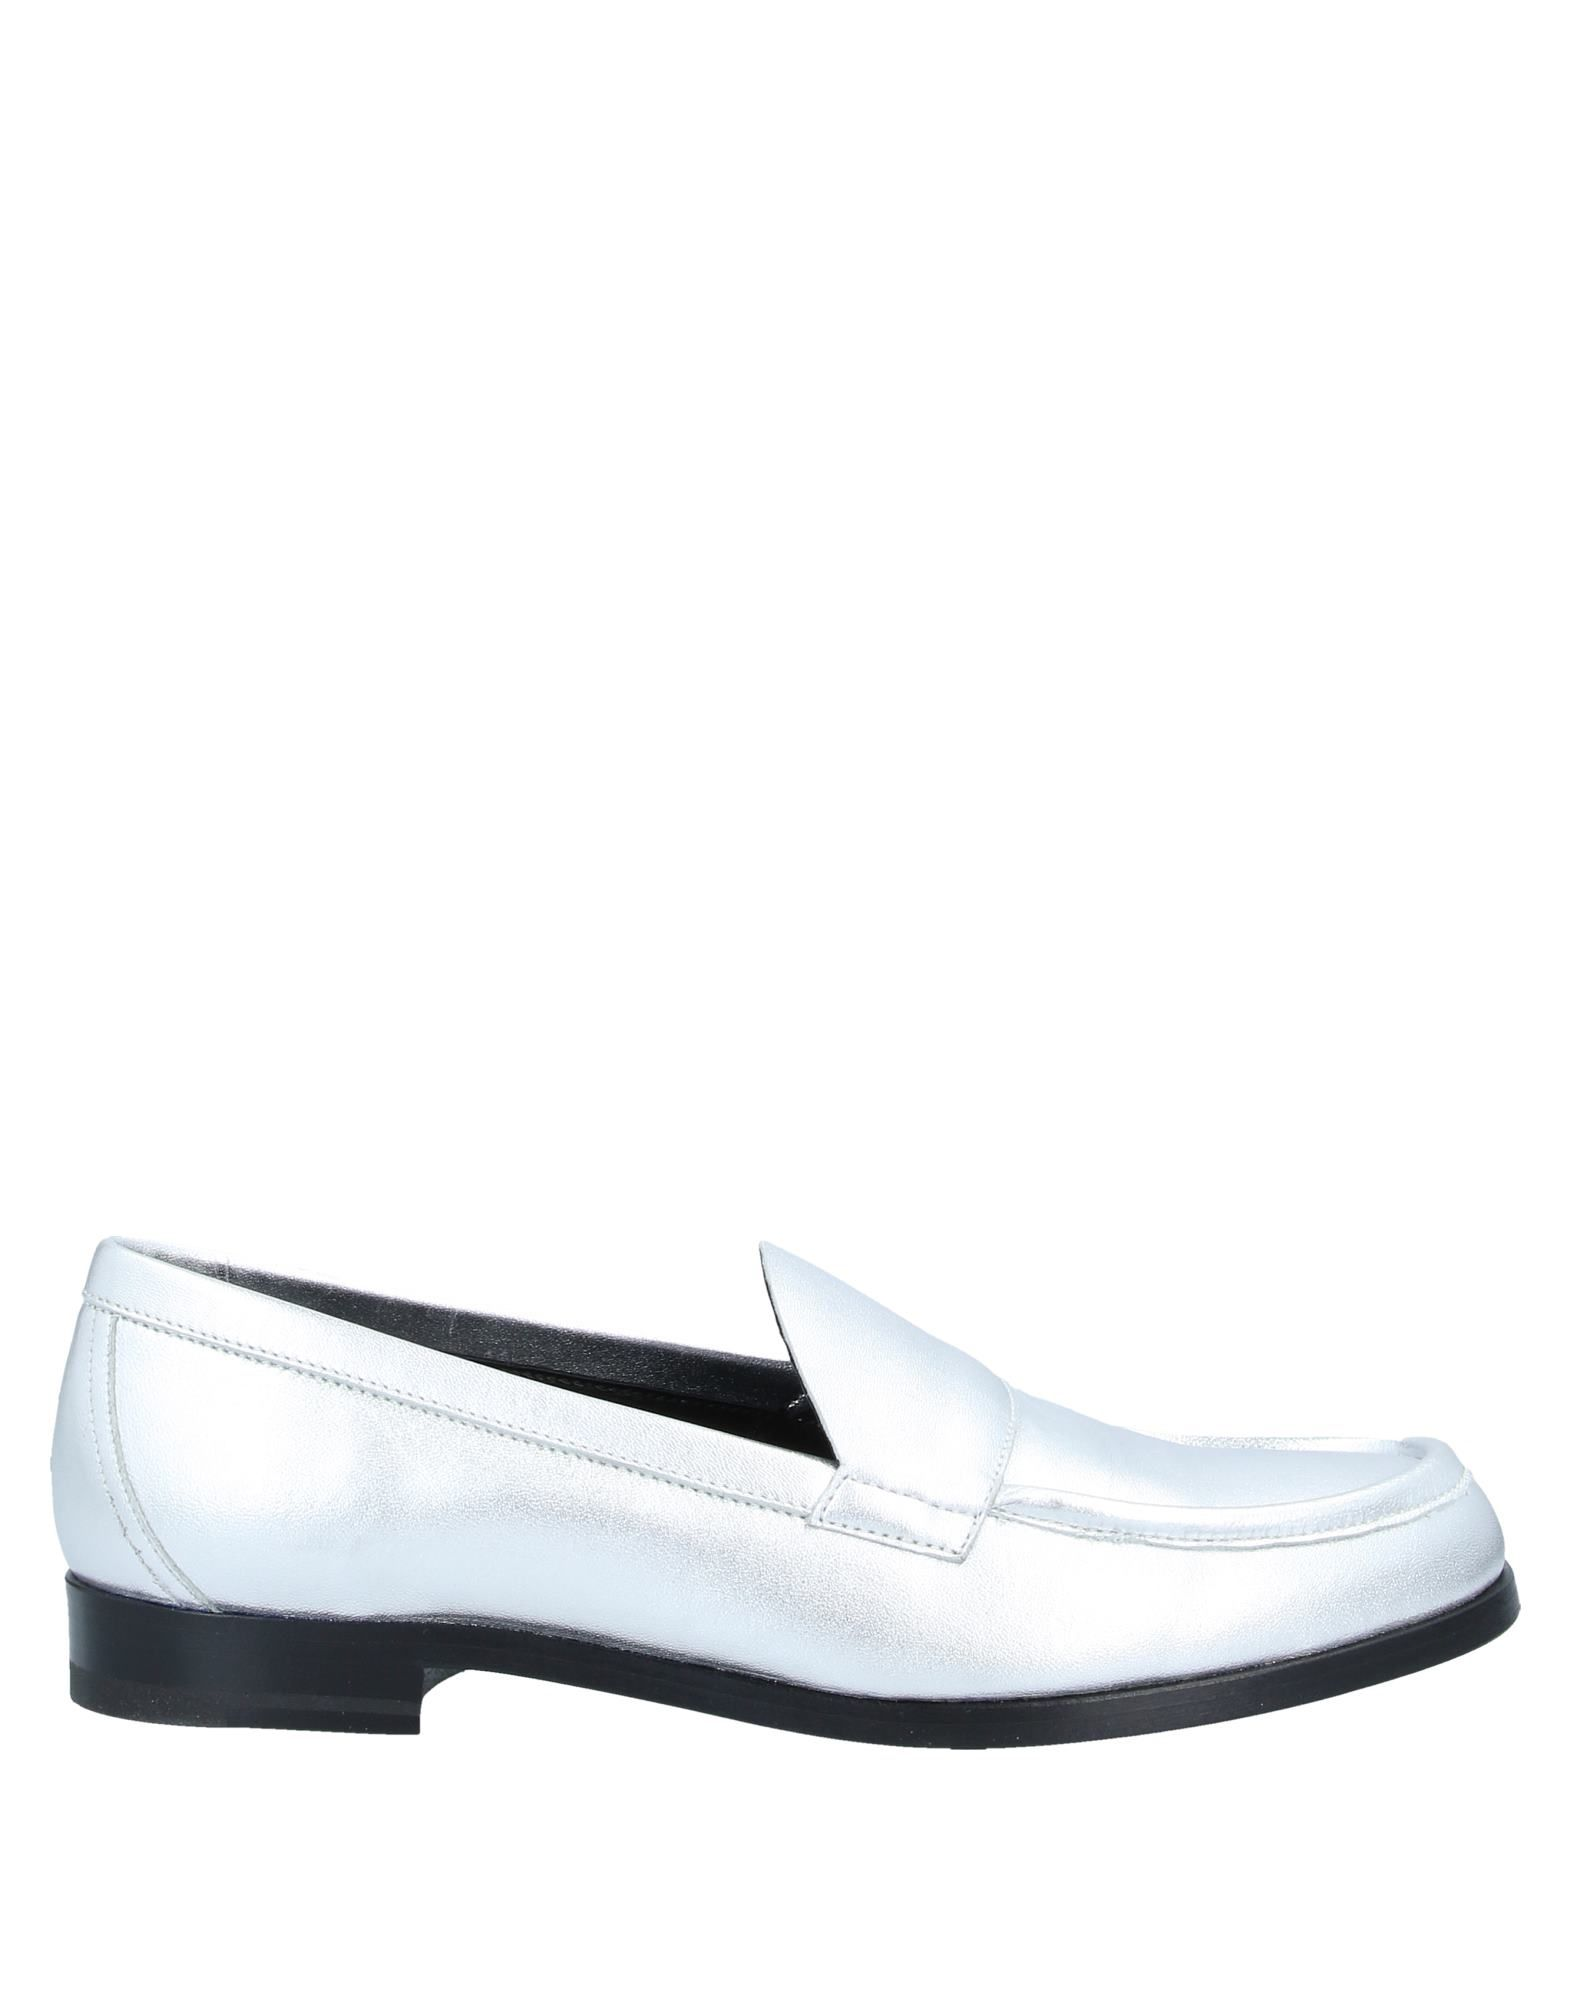 Фото - PIERRE HARDY Мокасины pierre hardy обувь на шнурках